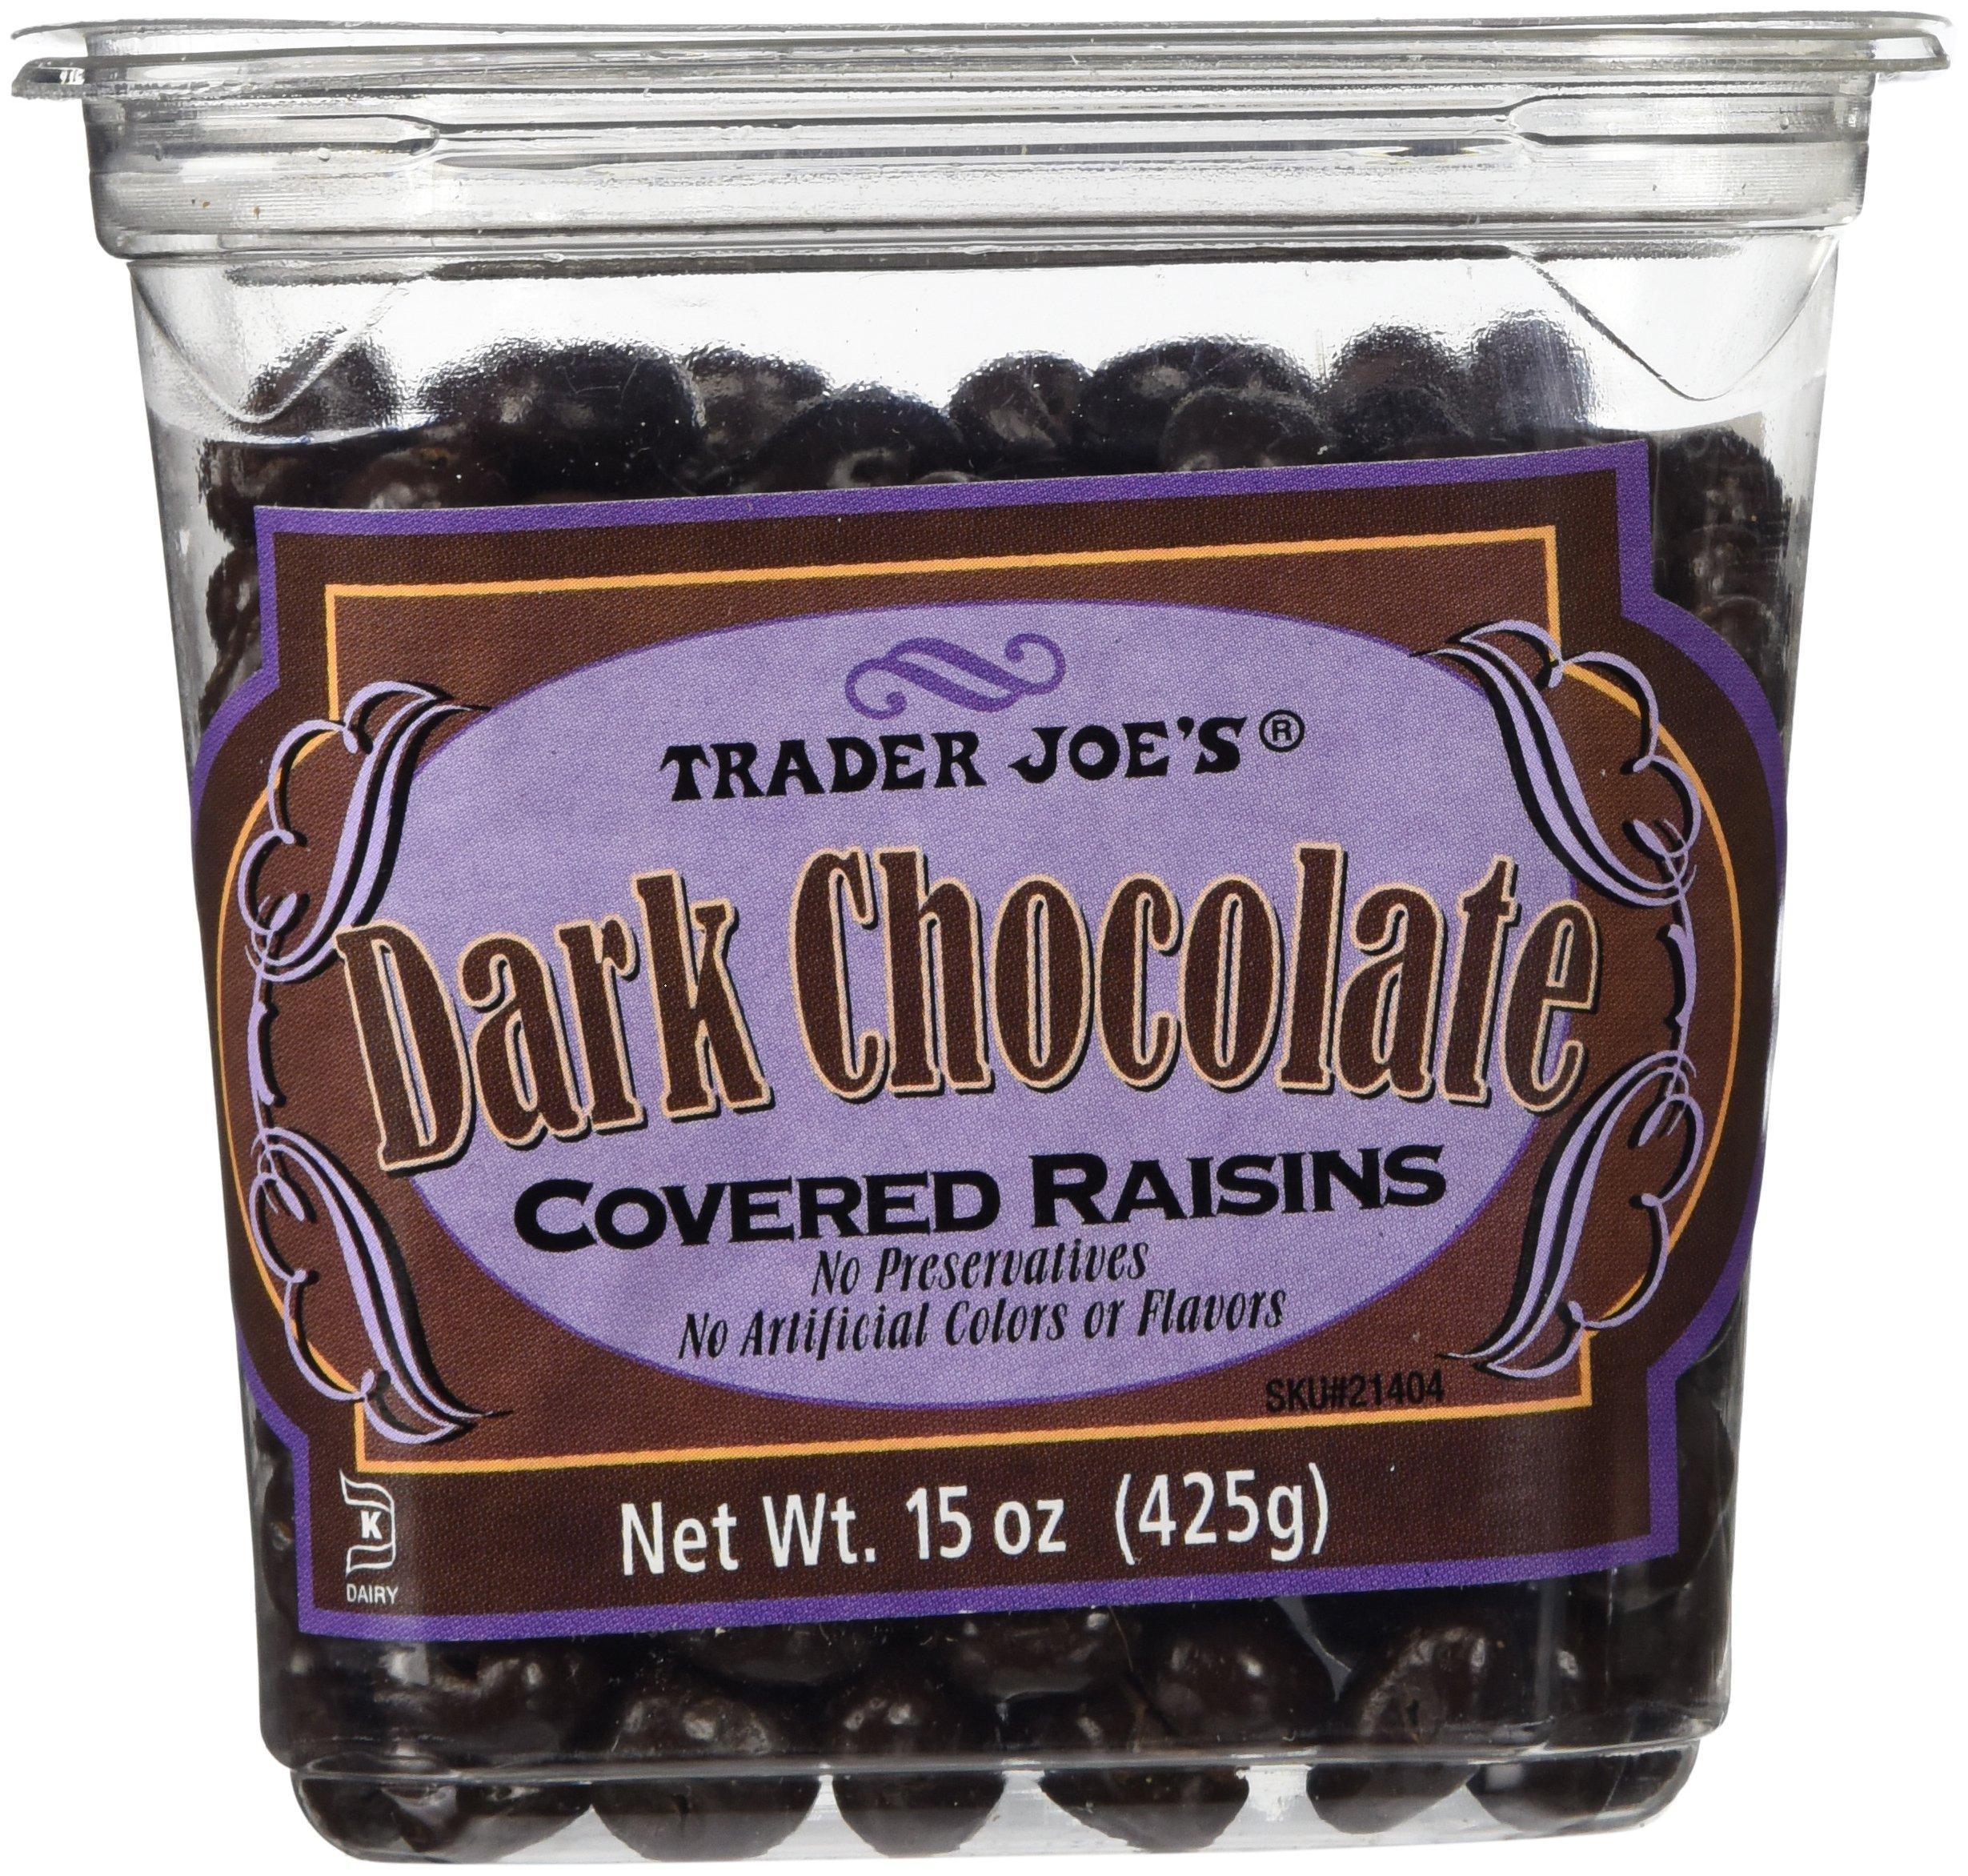 Trader Joes Dark Chocolate Covered Raisins by Trader Joe's